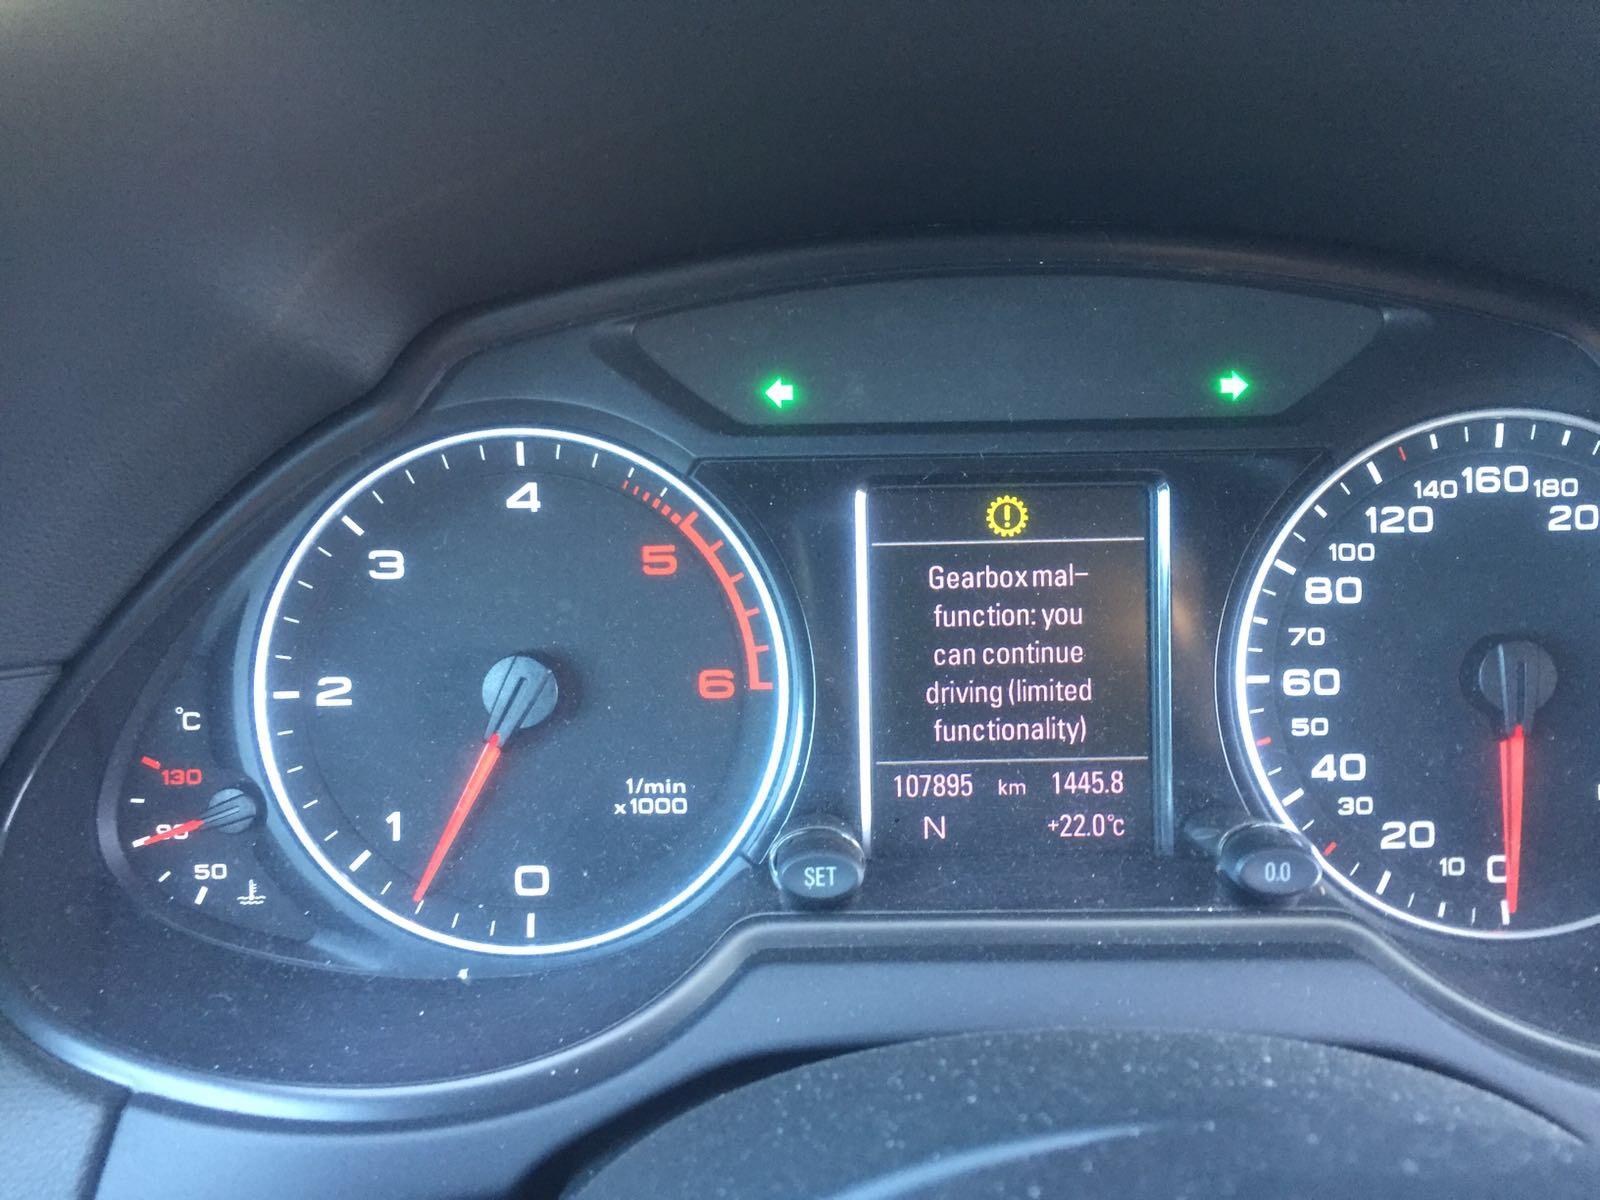 Gear box malfunction - Audi Q5 Club - Audi Owners Club (UK)